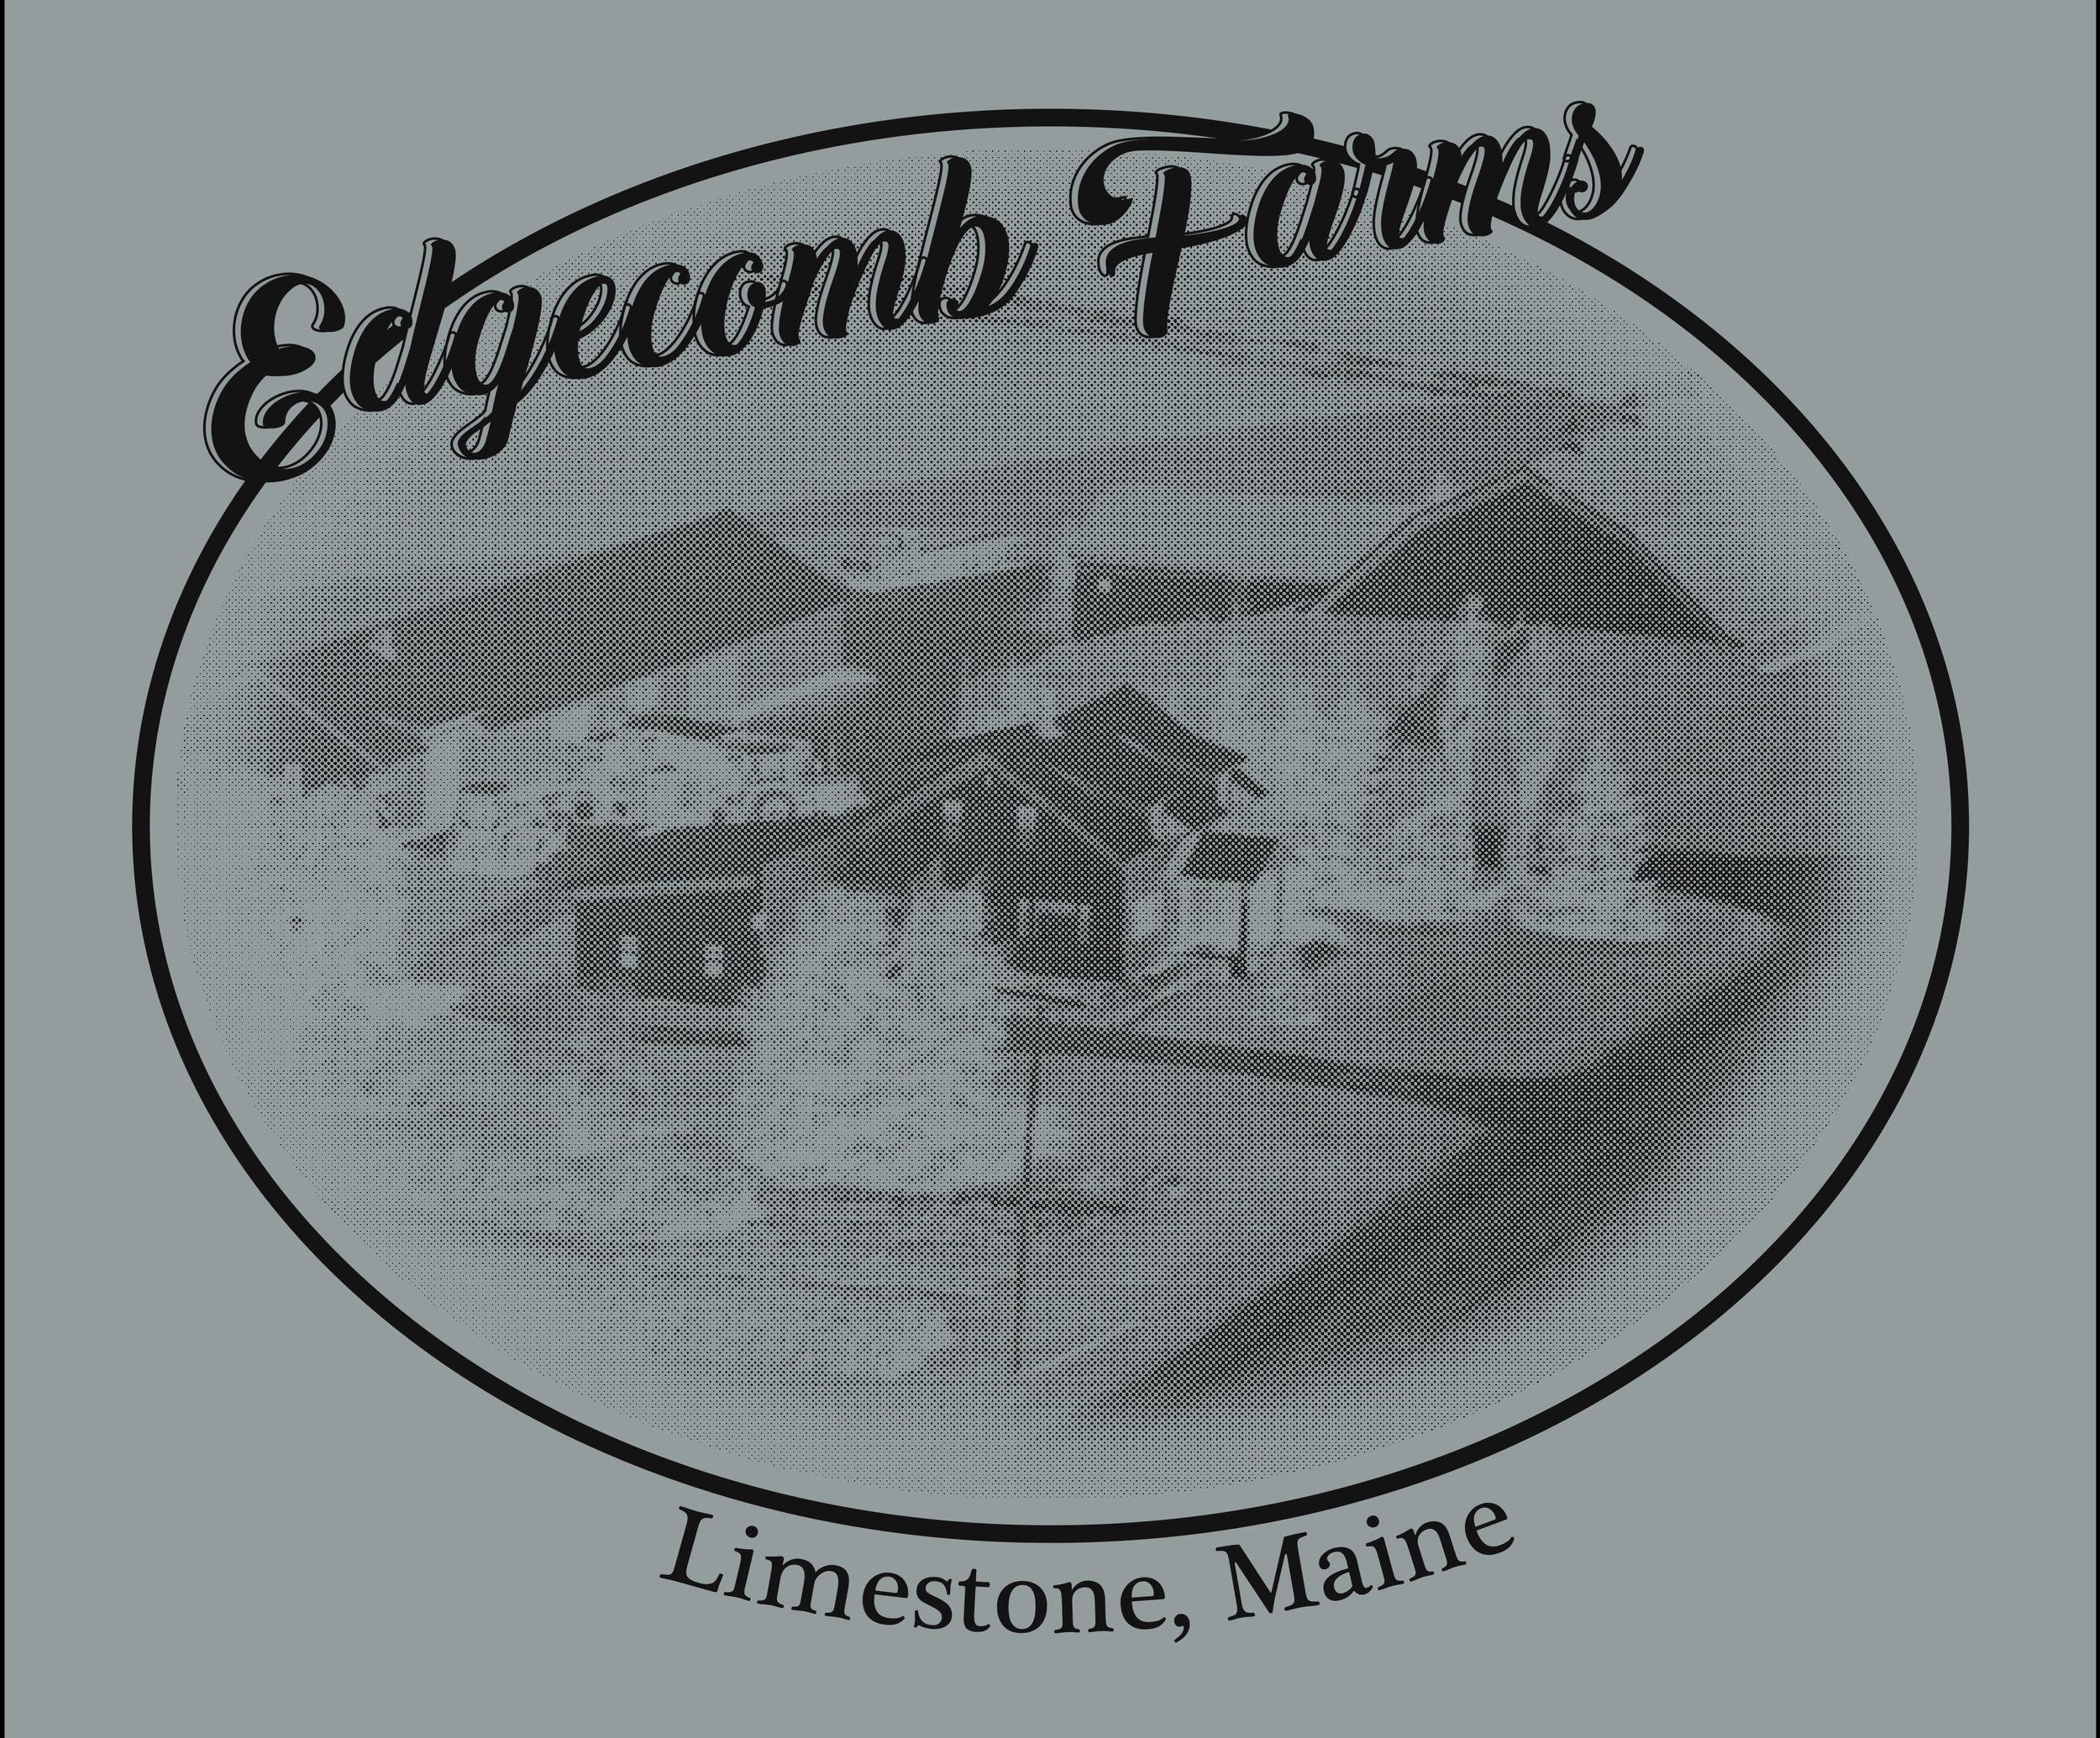 edgecomb farms.jpg